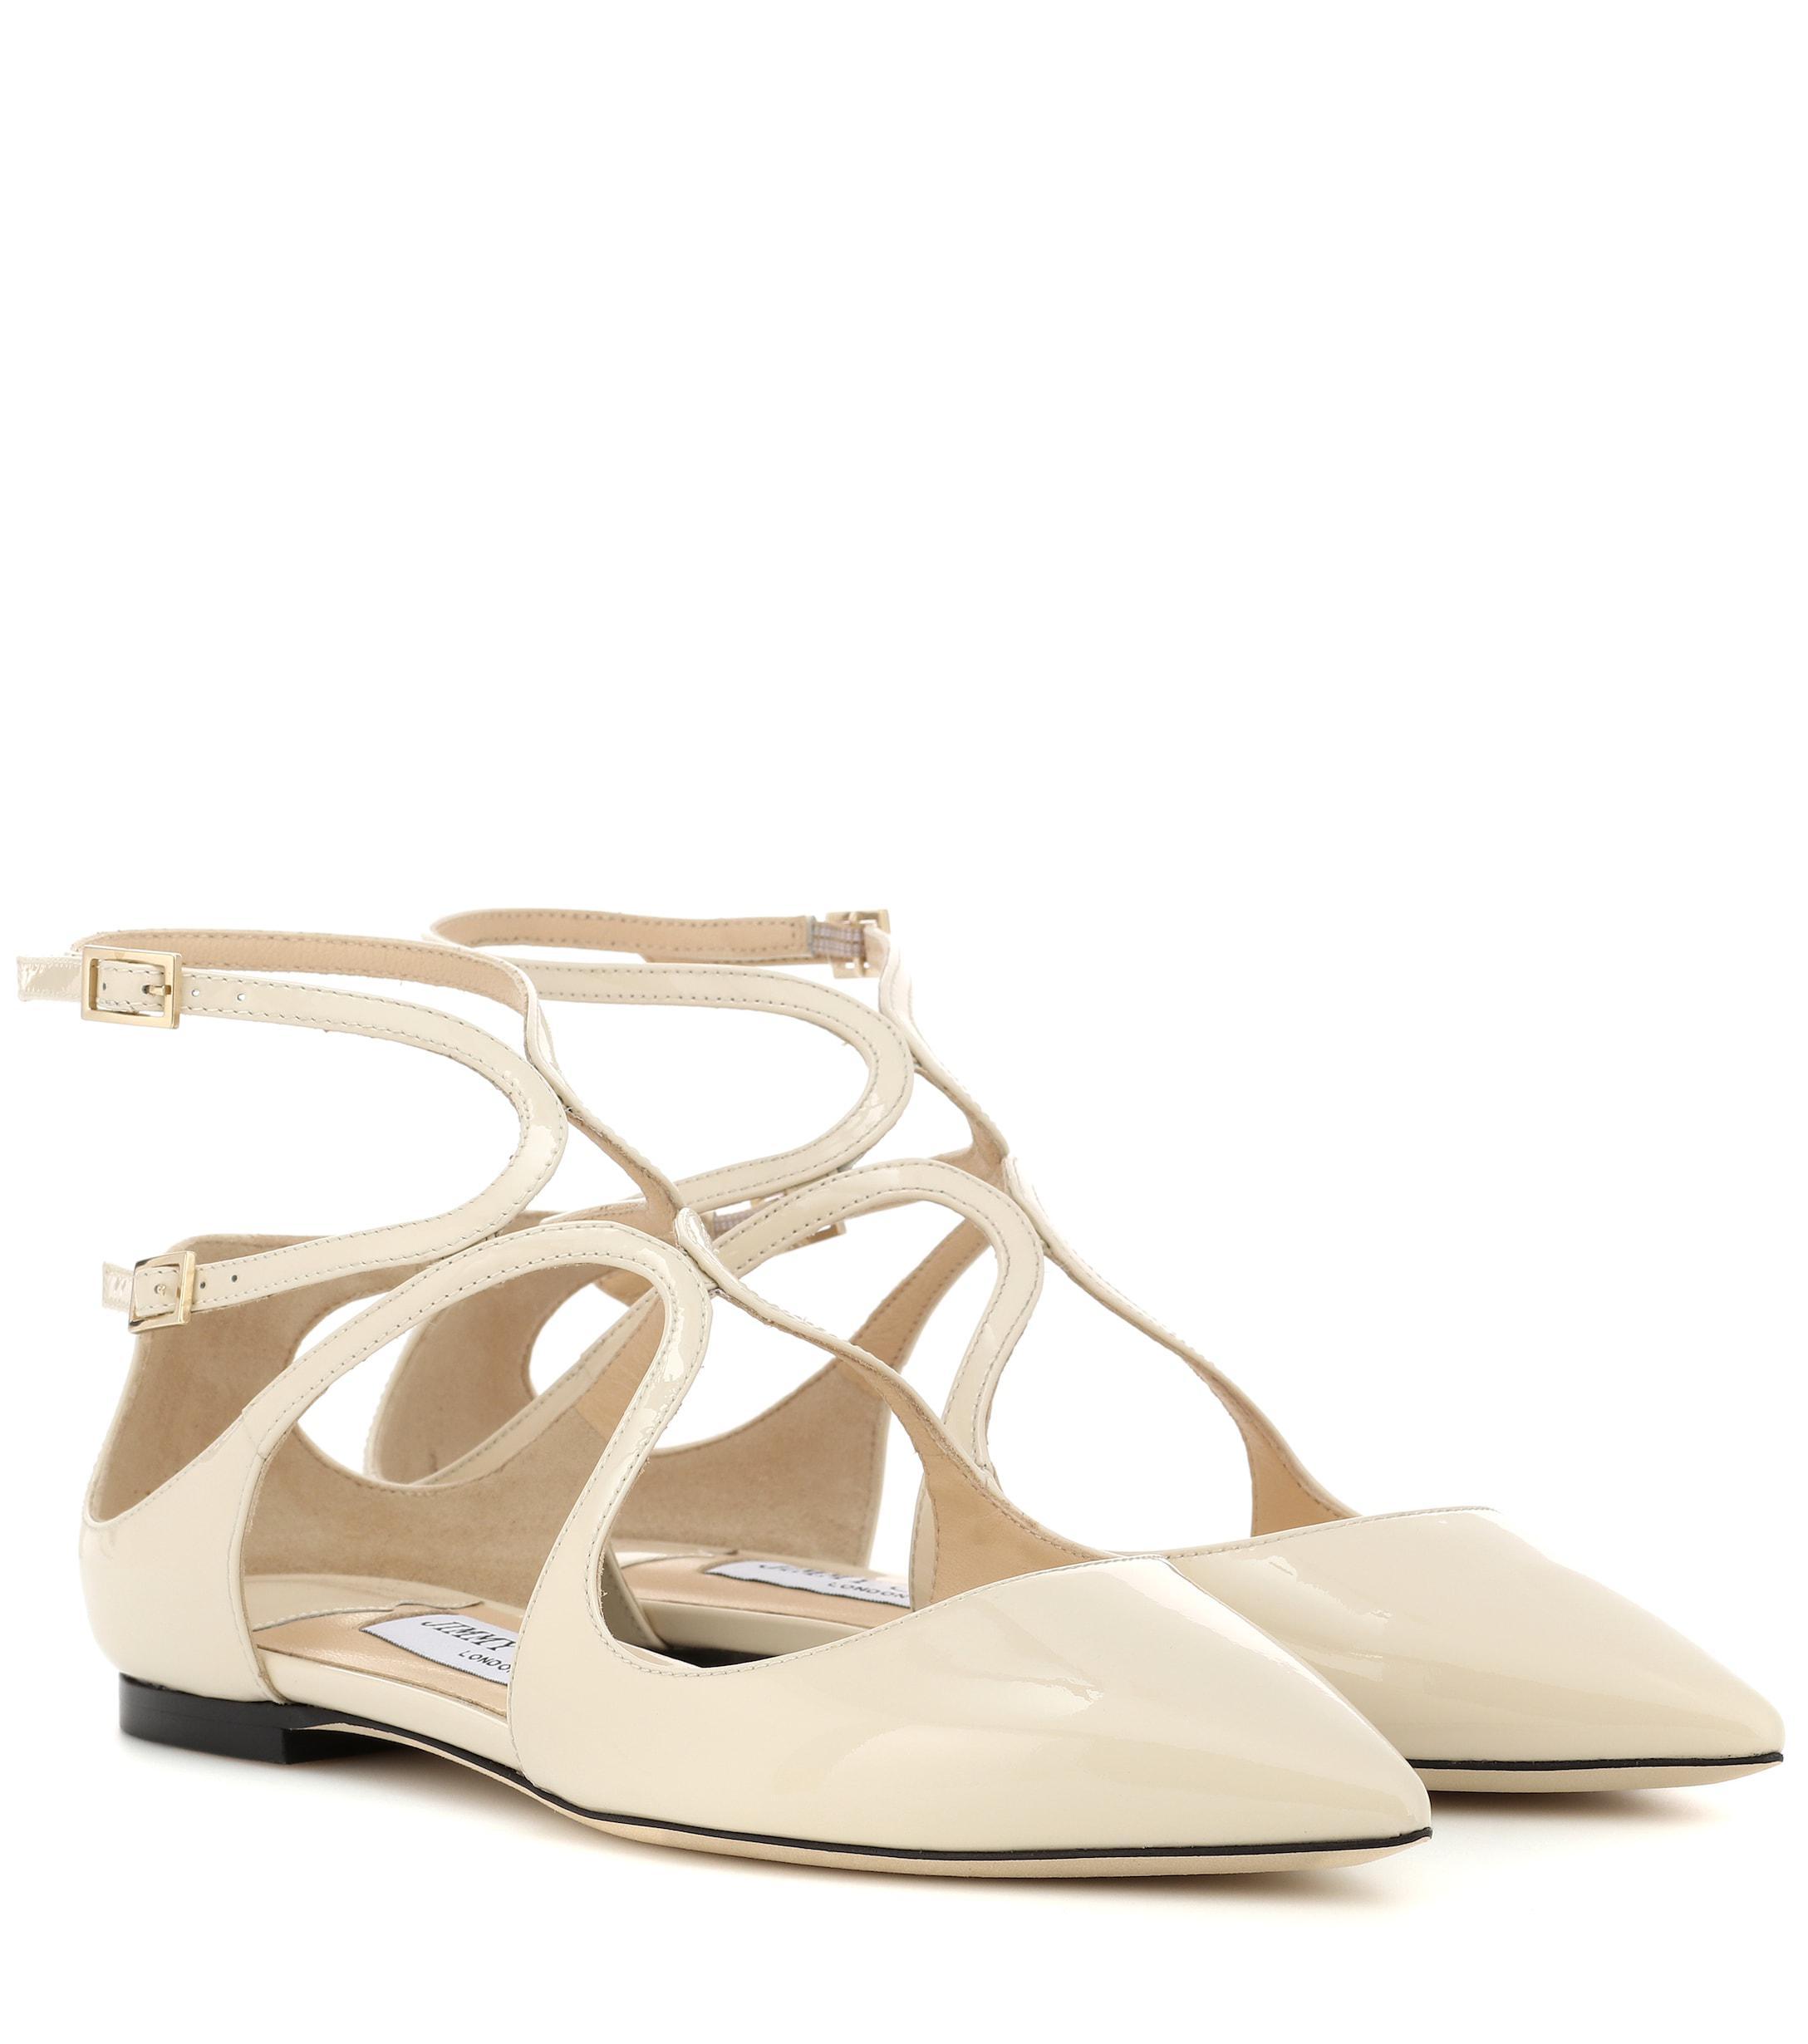 Jimmy Choo Lancer Patent Leather Ballet Flats Lyst